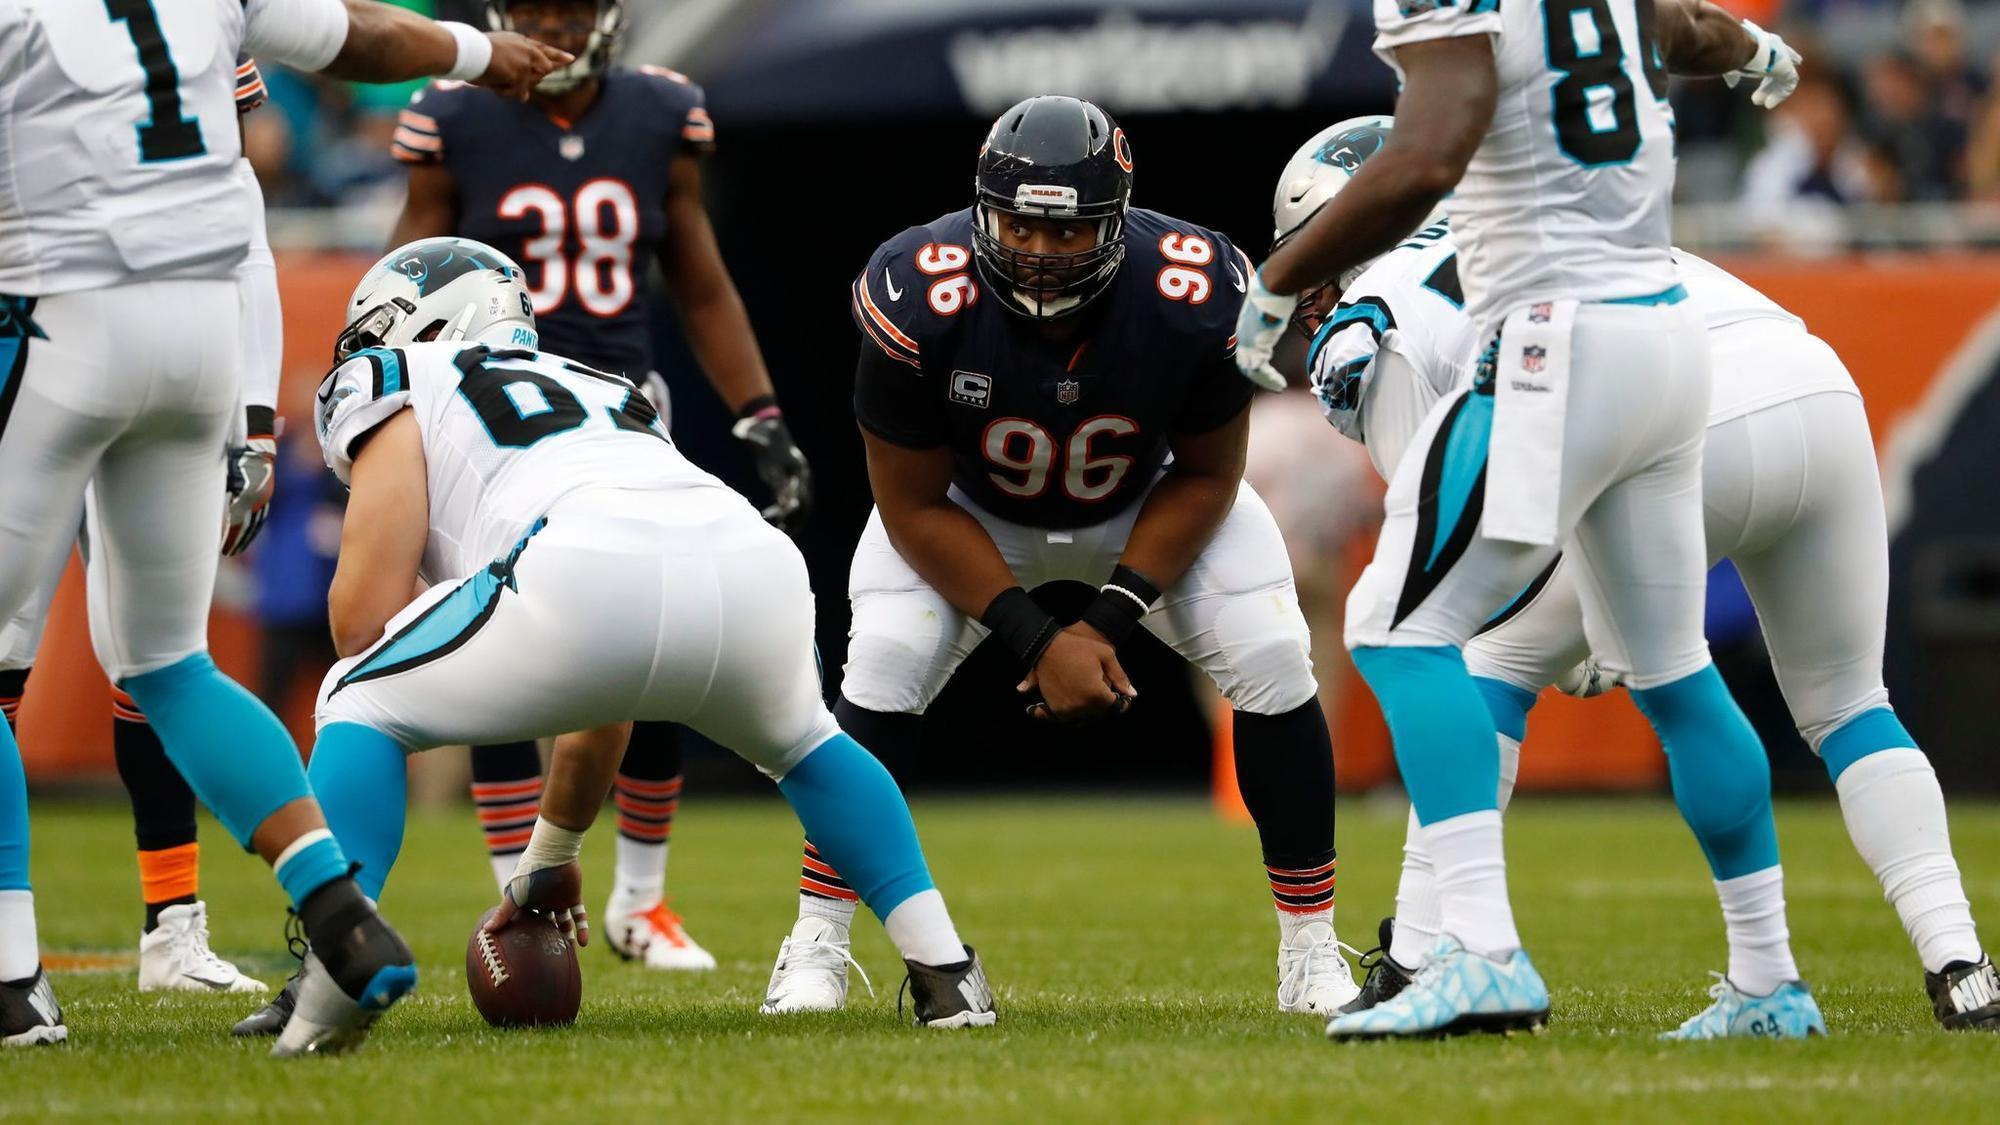 Ct-spt-bears-defensive-line-review-biggs-20180213